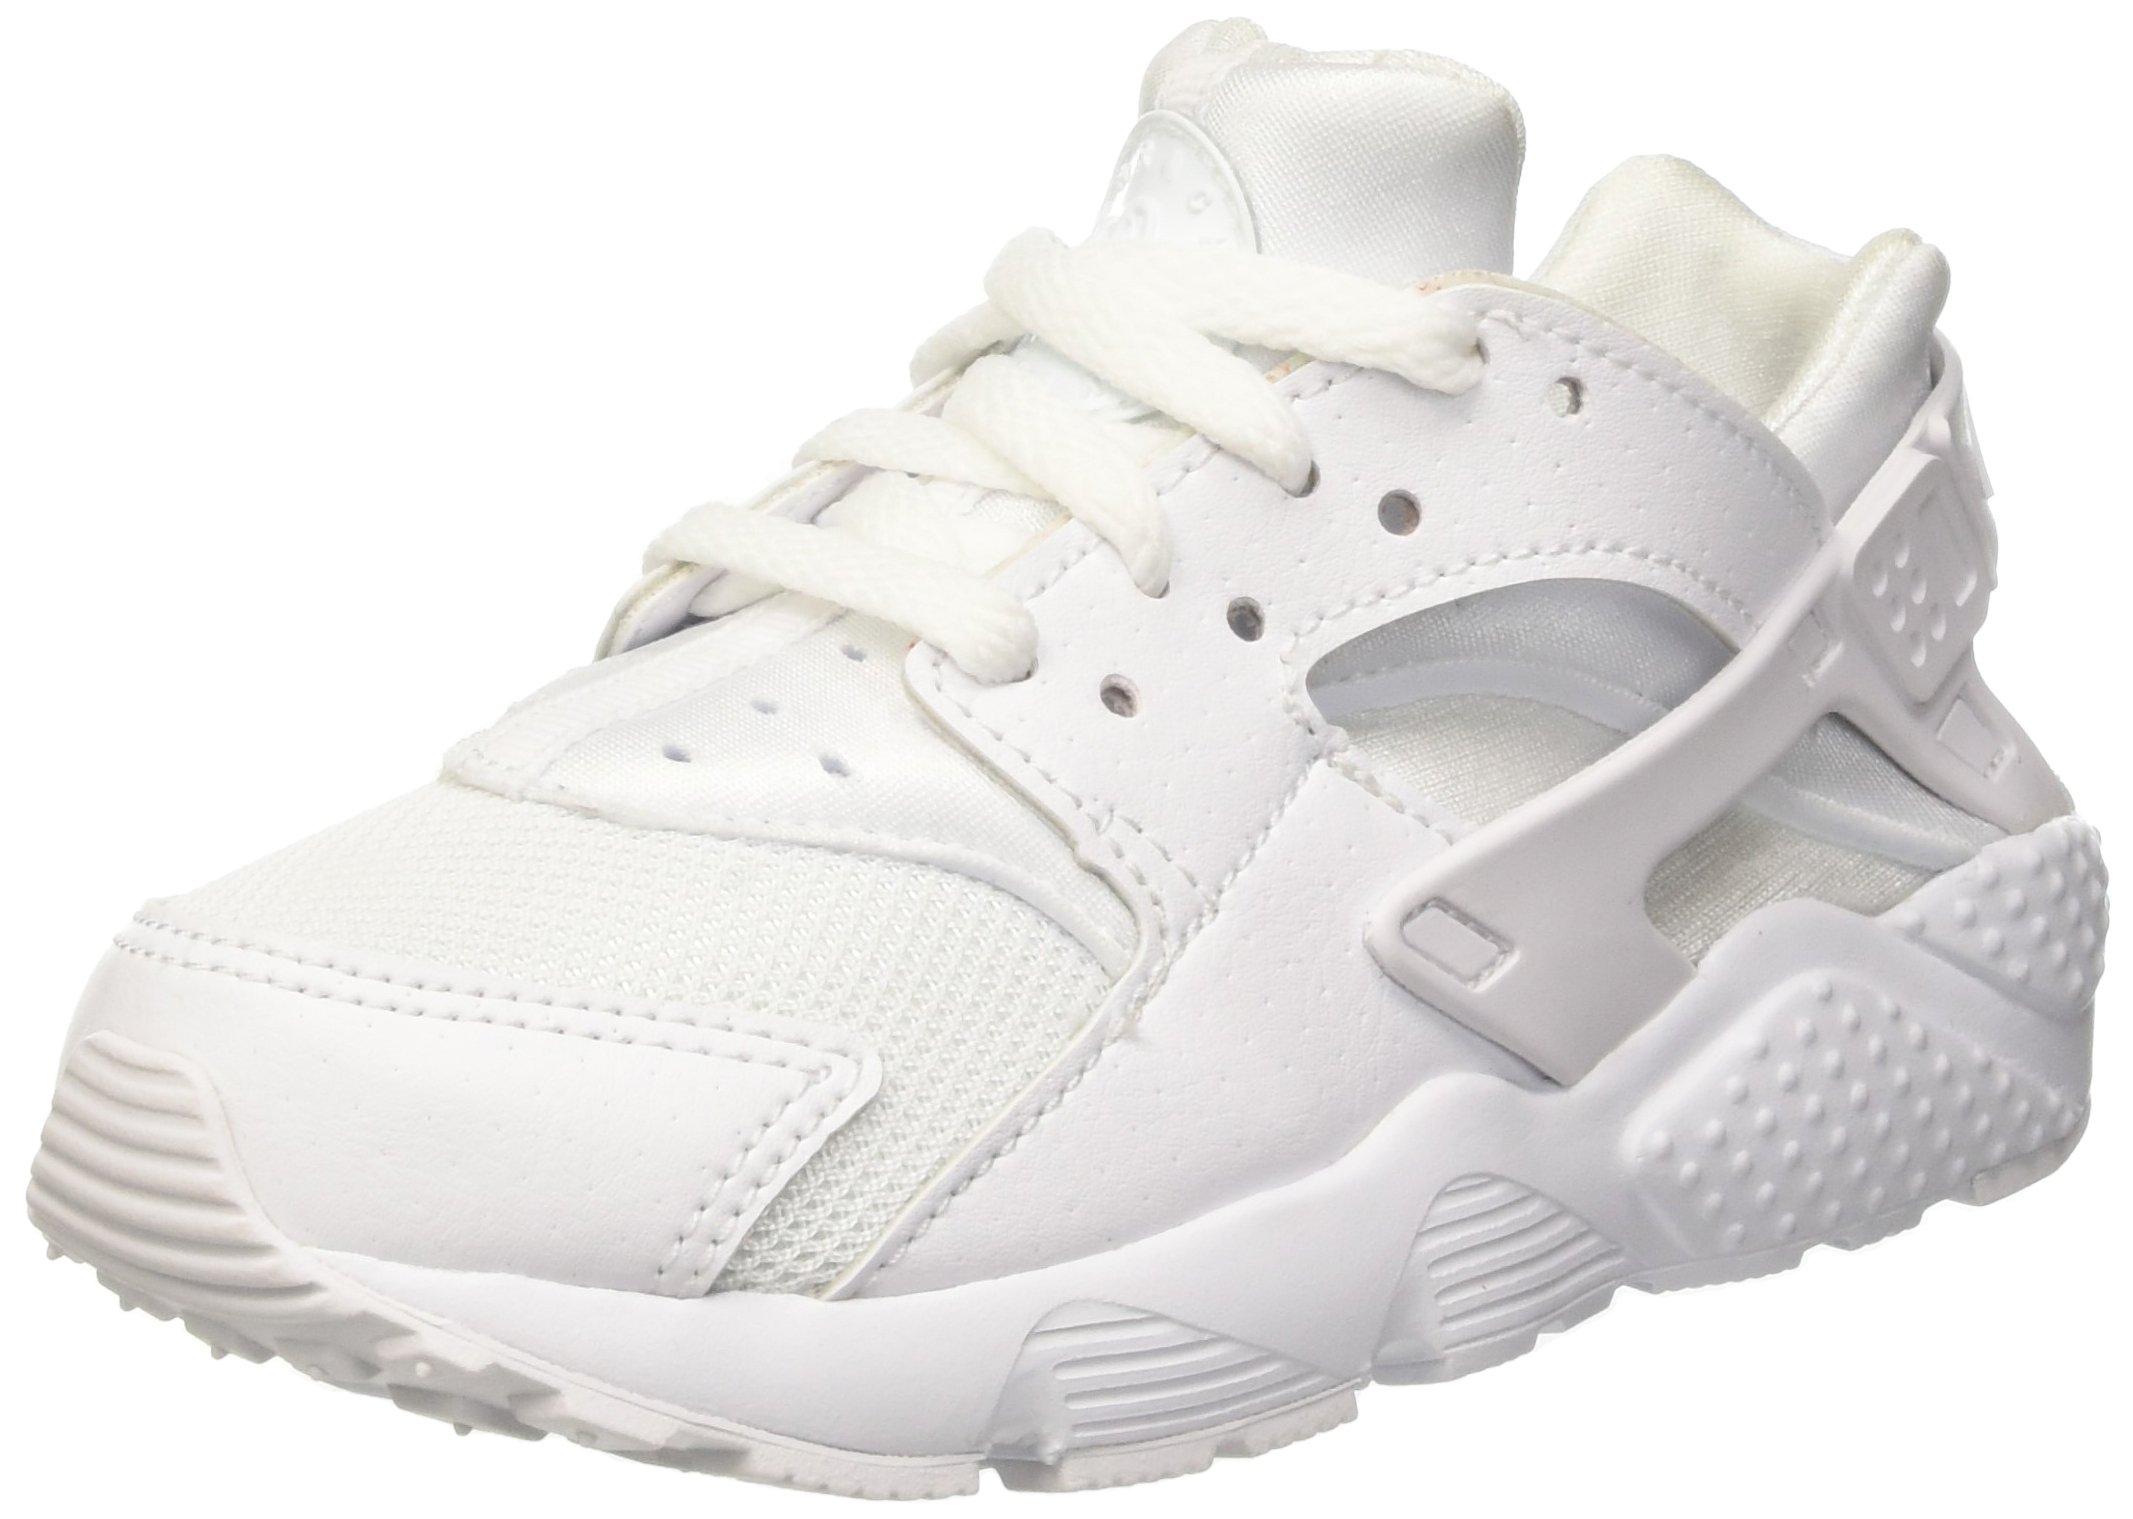 Nike Huarache Little Kids Running Shoes White/Pure Platinum 704949-110 (11.5 M US)